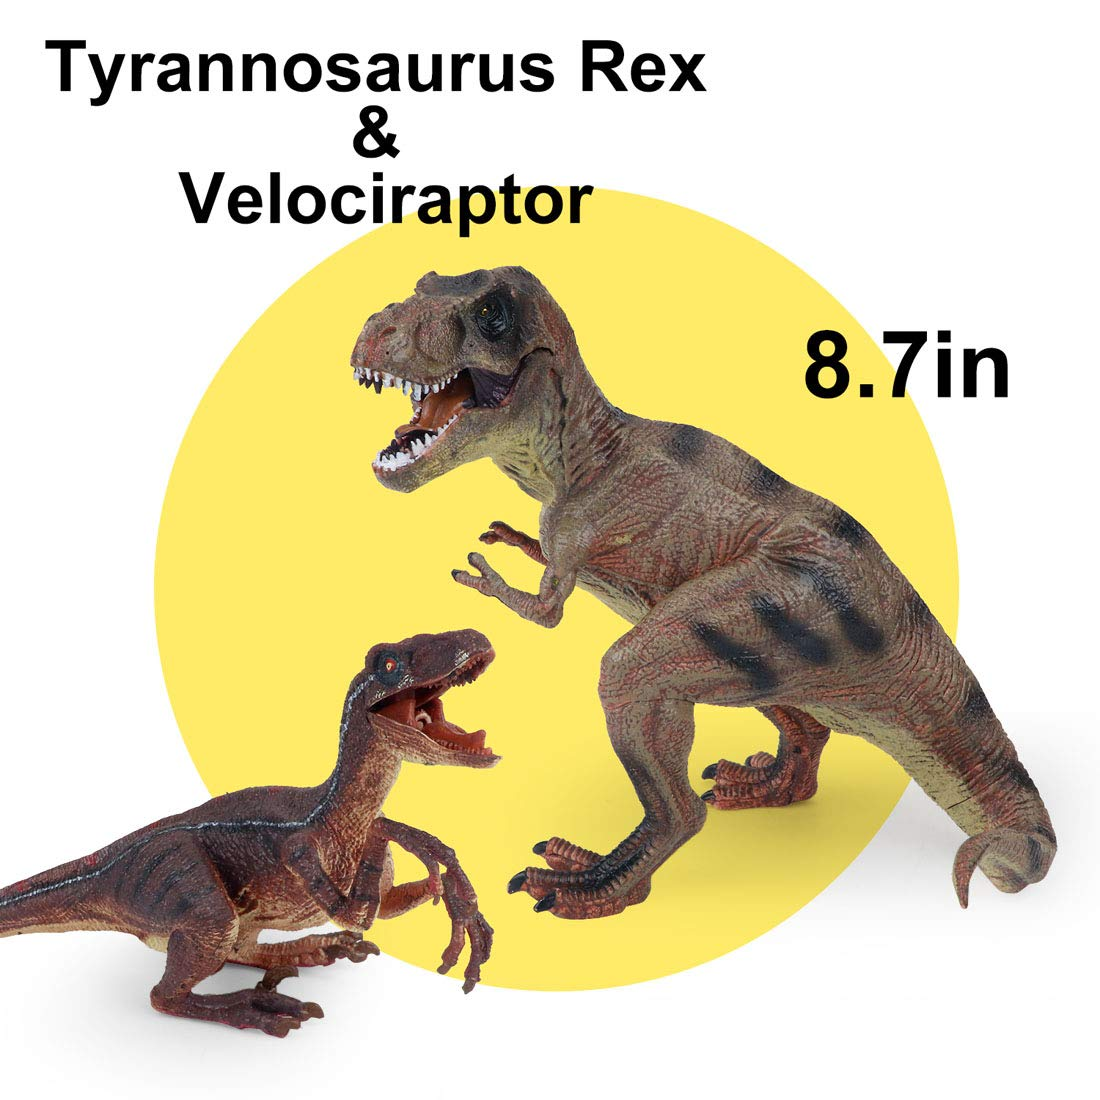 Winsenpro 5PCS Jumbo Dinosaur Set,13? Realistic Looking Dinosaur Toy Set for Party Gift,Boys Girls Children's Birthday Gifts (5PCS Dinosaurs)